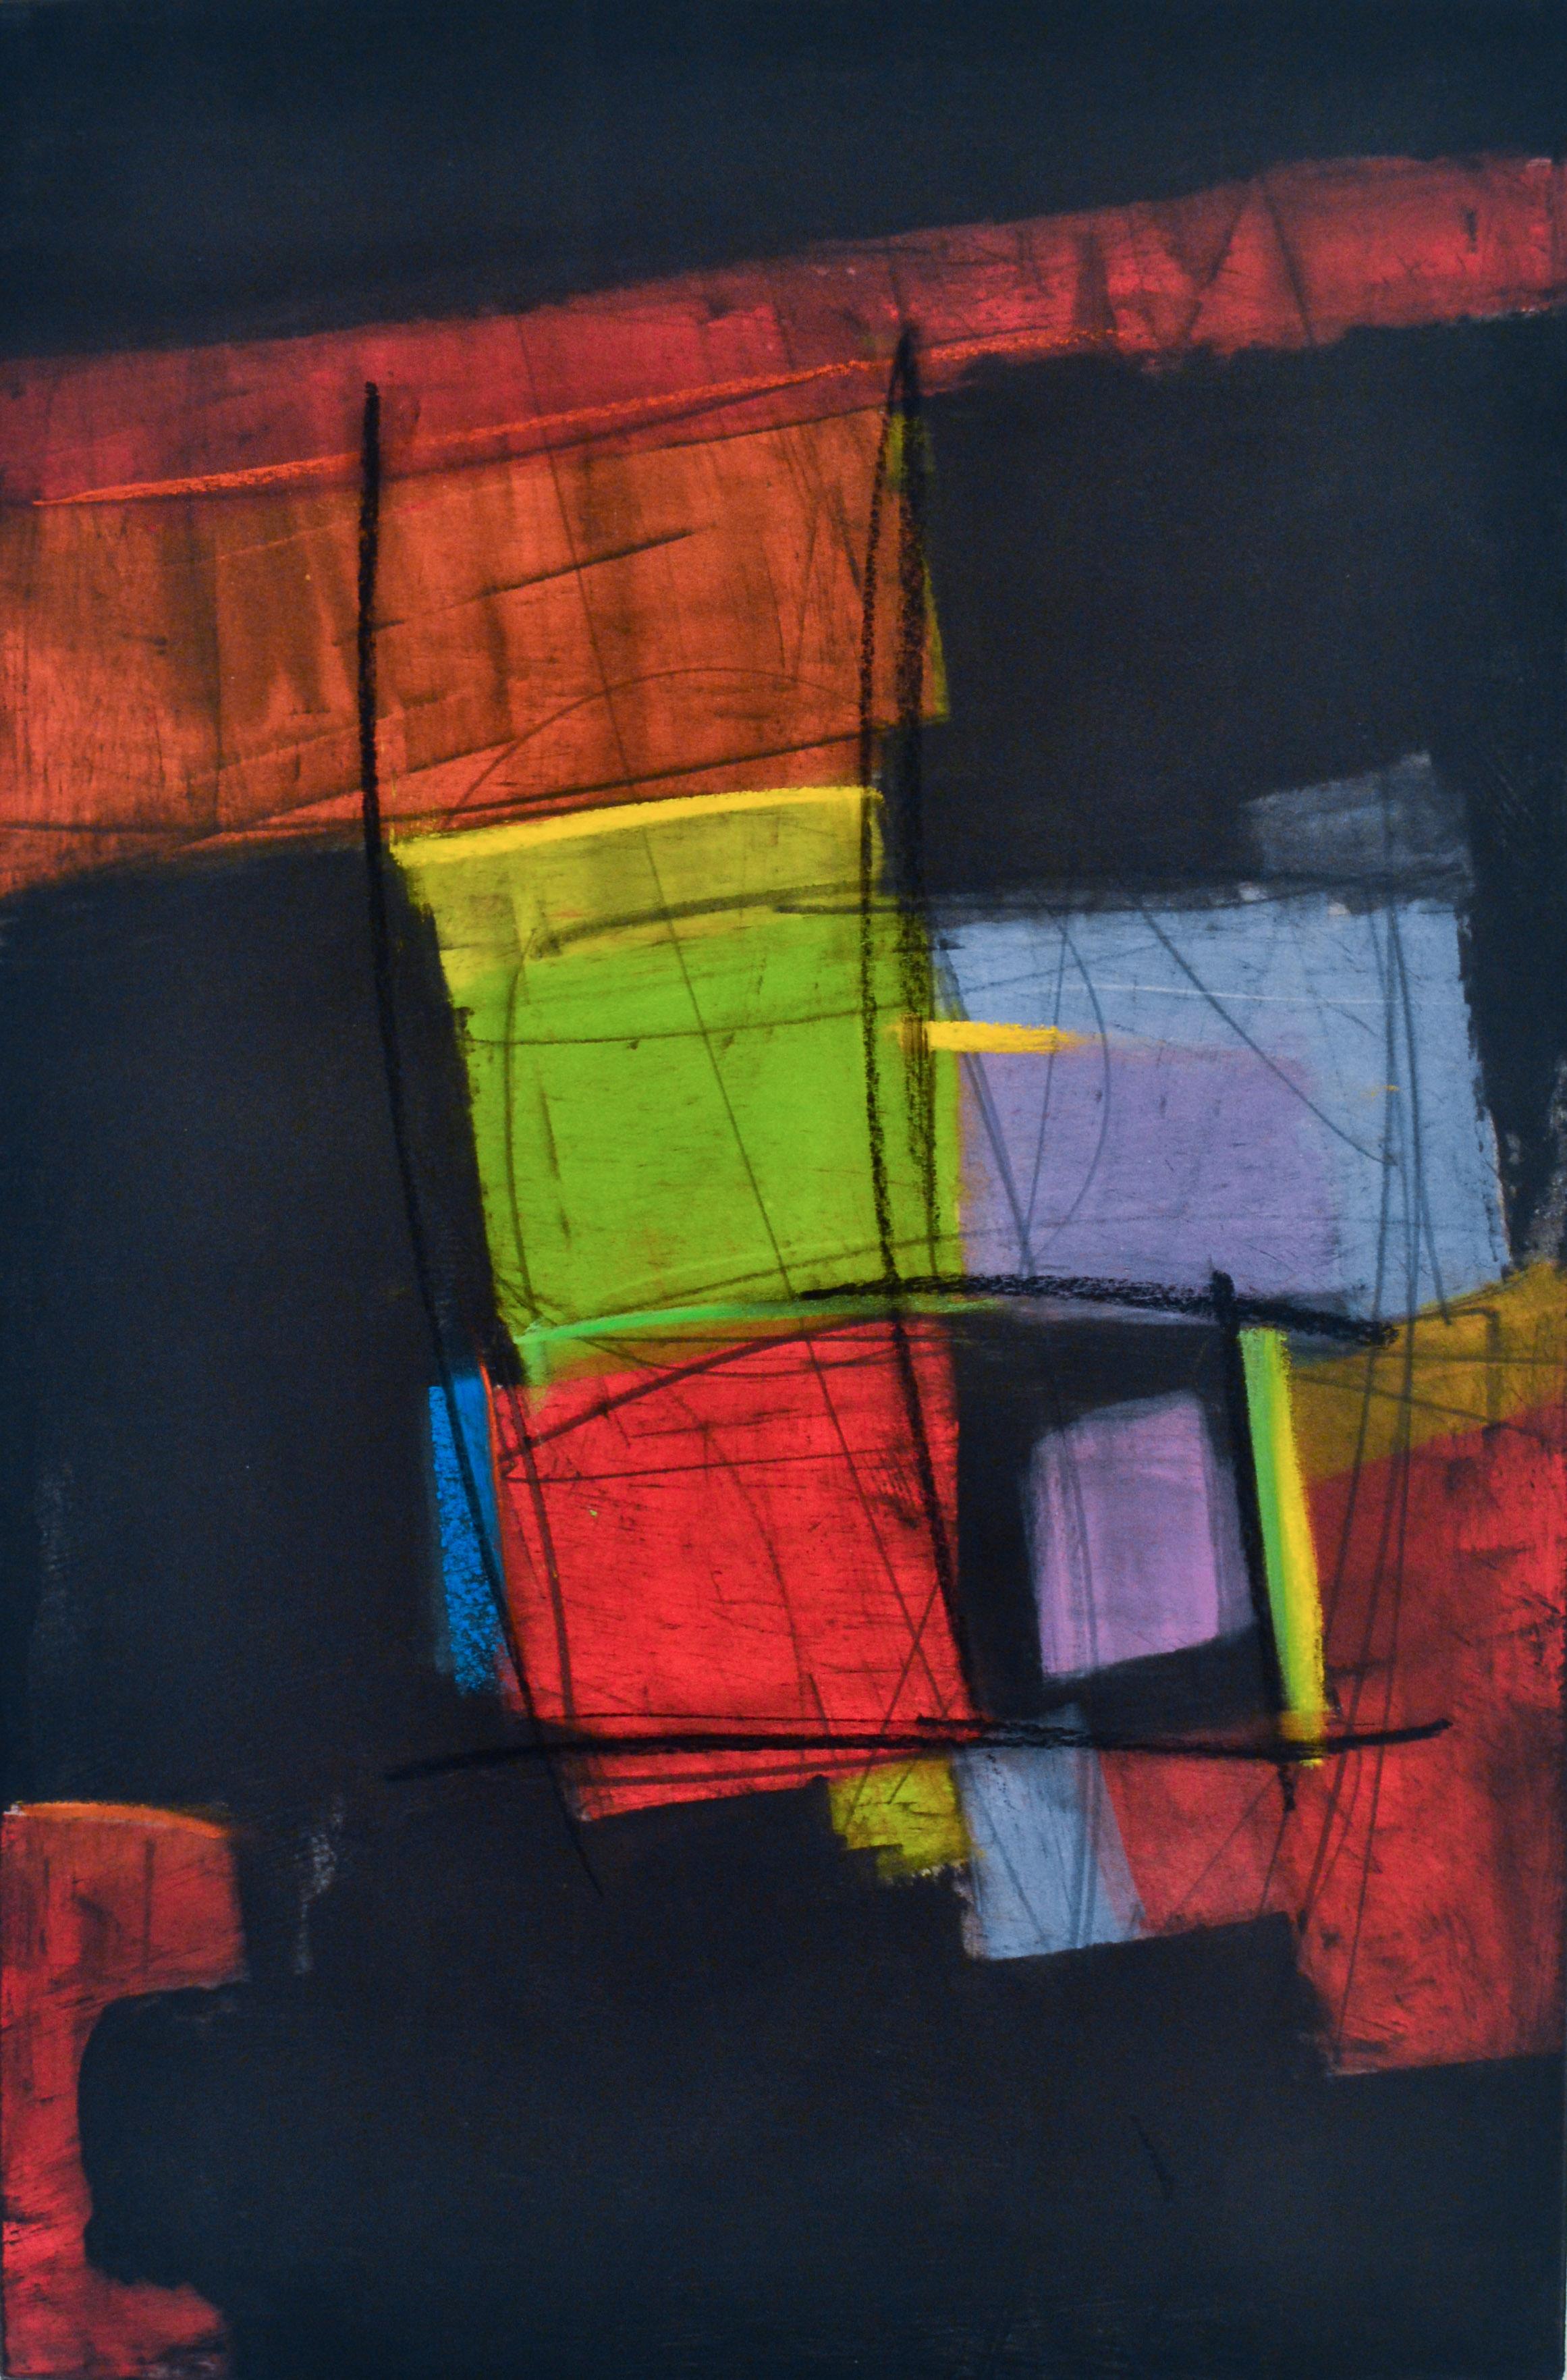 """Untitled"" No. 3, 2013"